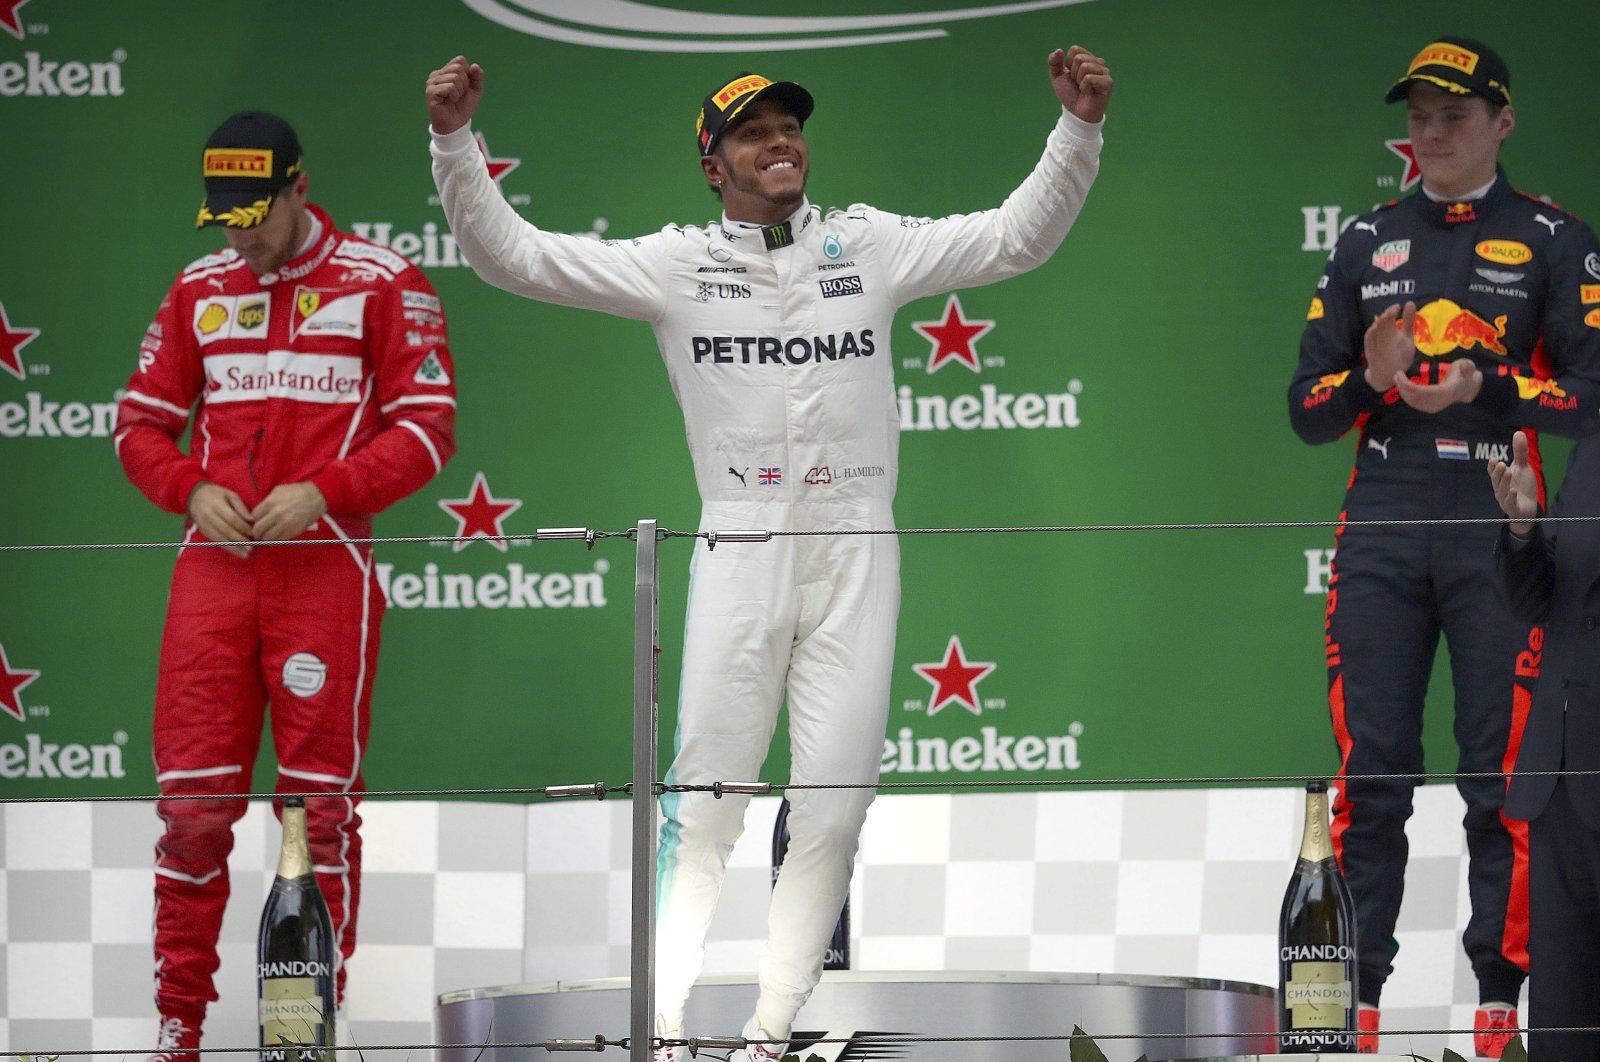 Lewis Hamilton (C), Sebastian Vettel (L) and Max Verstappen at the podium at the Chinese Grand Prix, in Shanghai, China, April 9, 2017. (AP Photo)